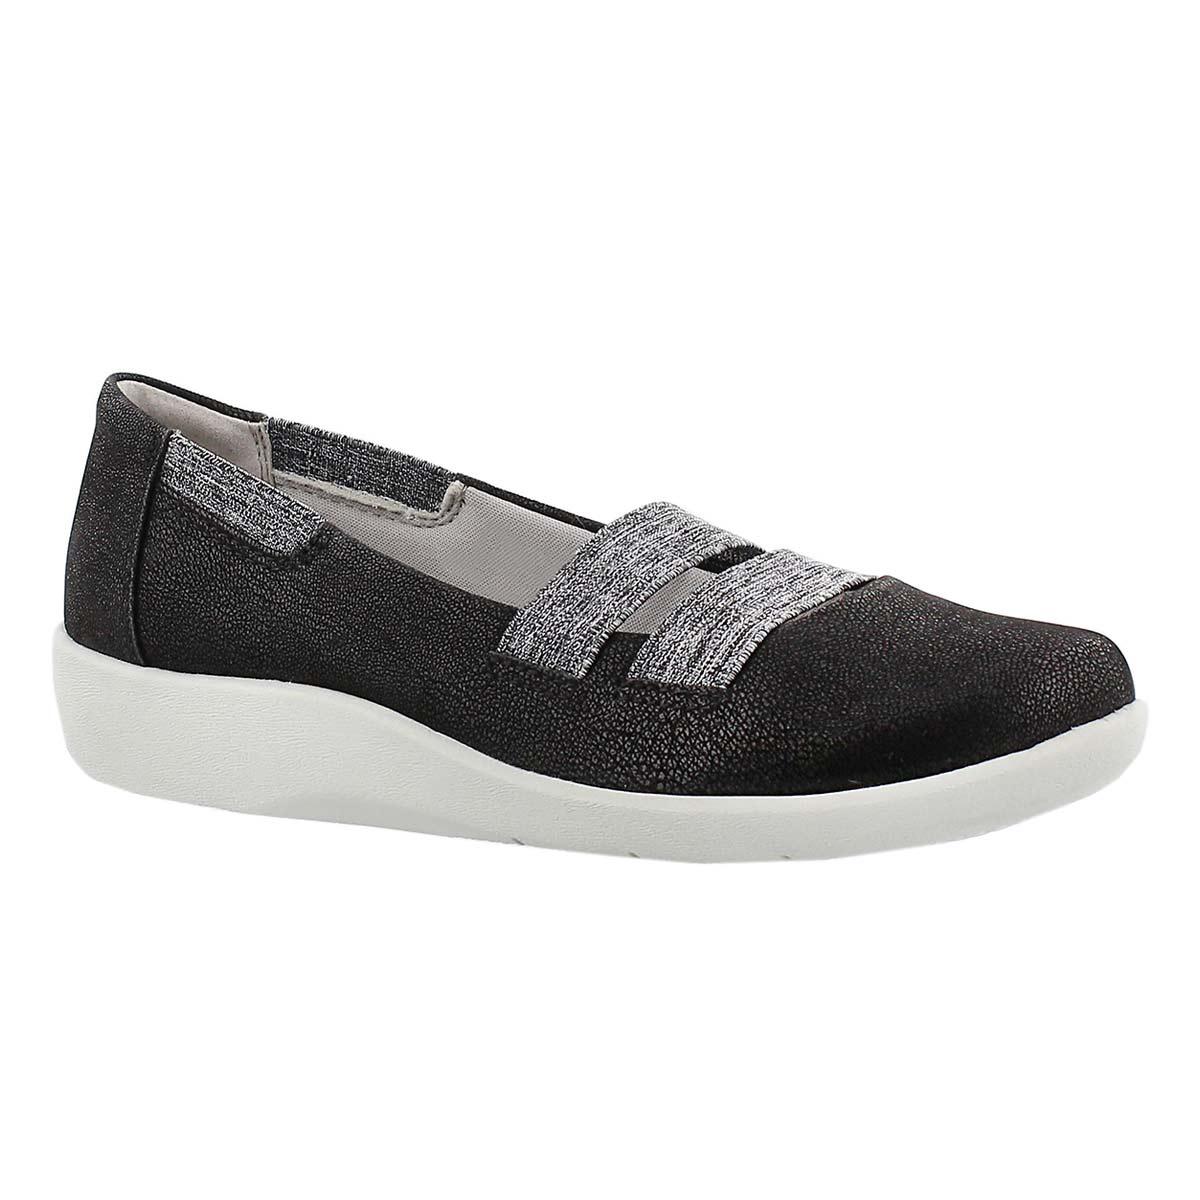 Lds Sillian Rest blk slip on casual shoe